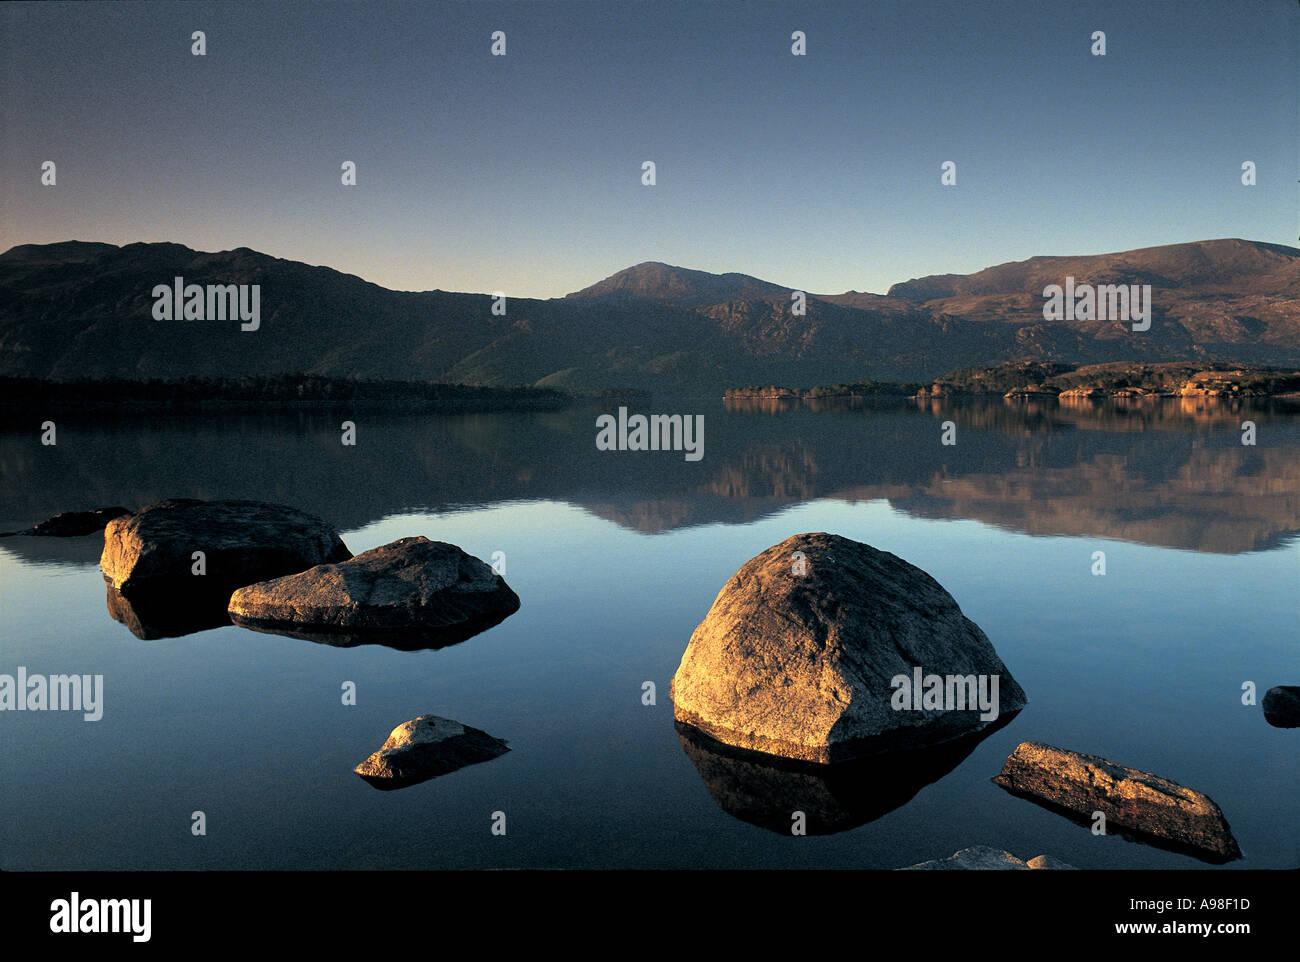 Loch Maree Scotland UK - Stock Image